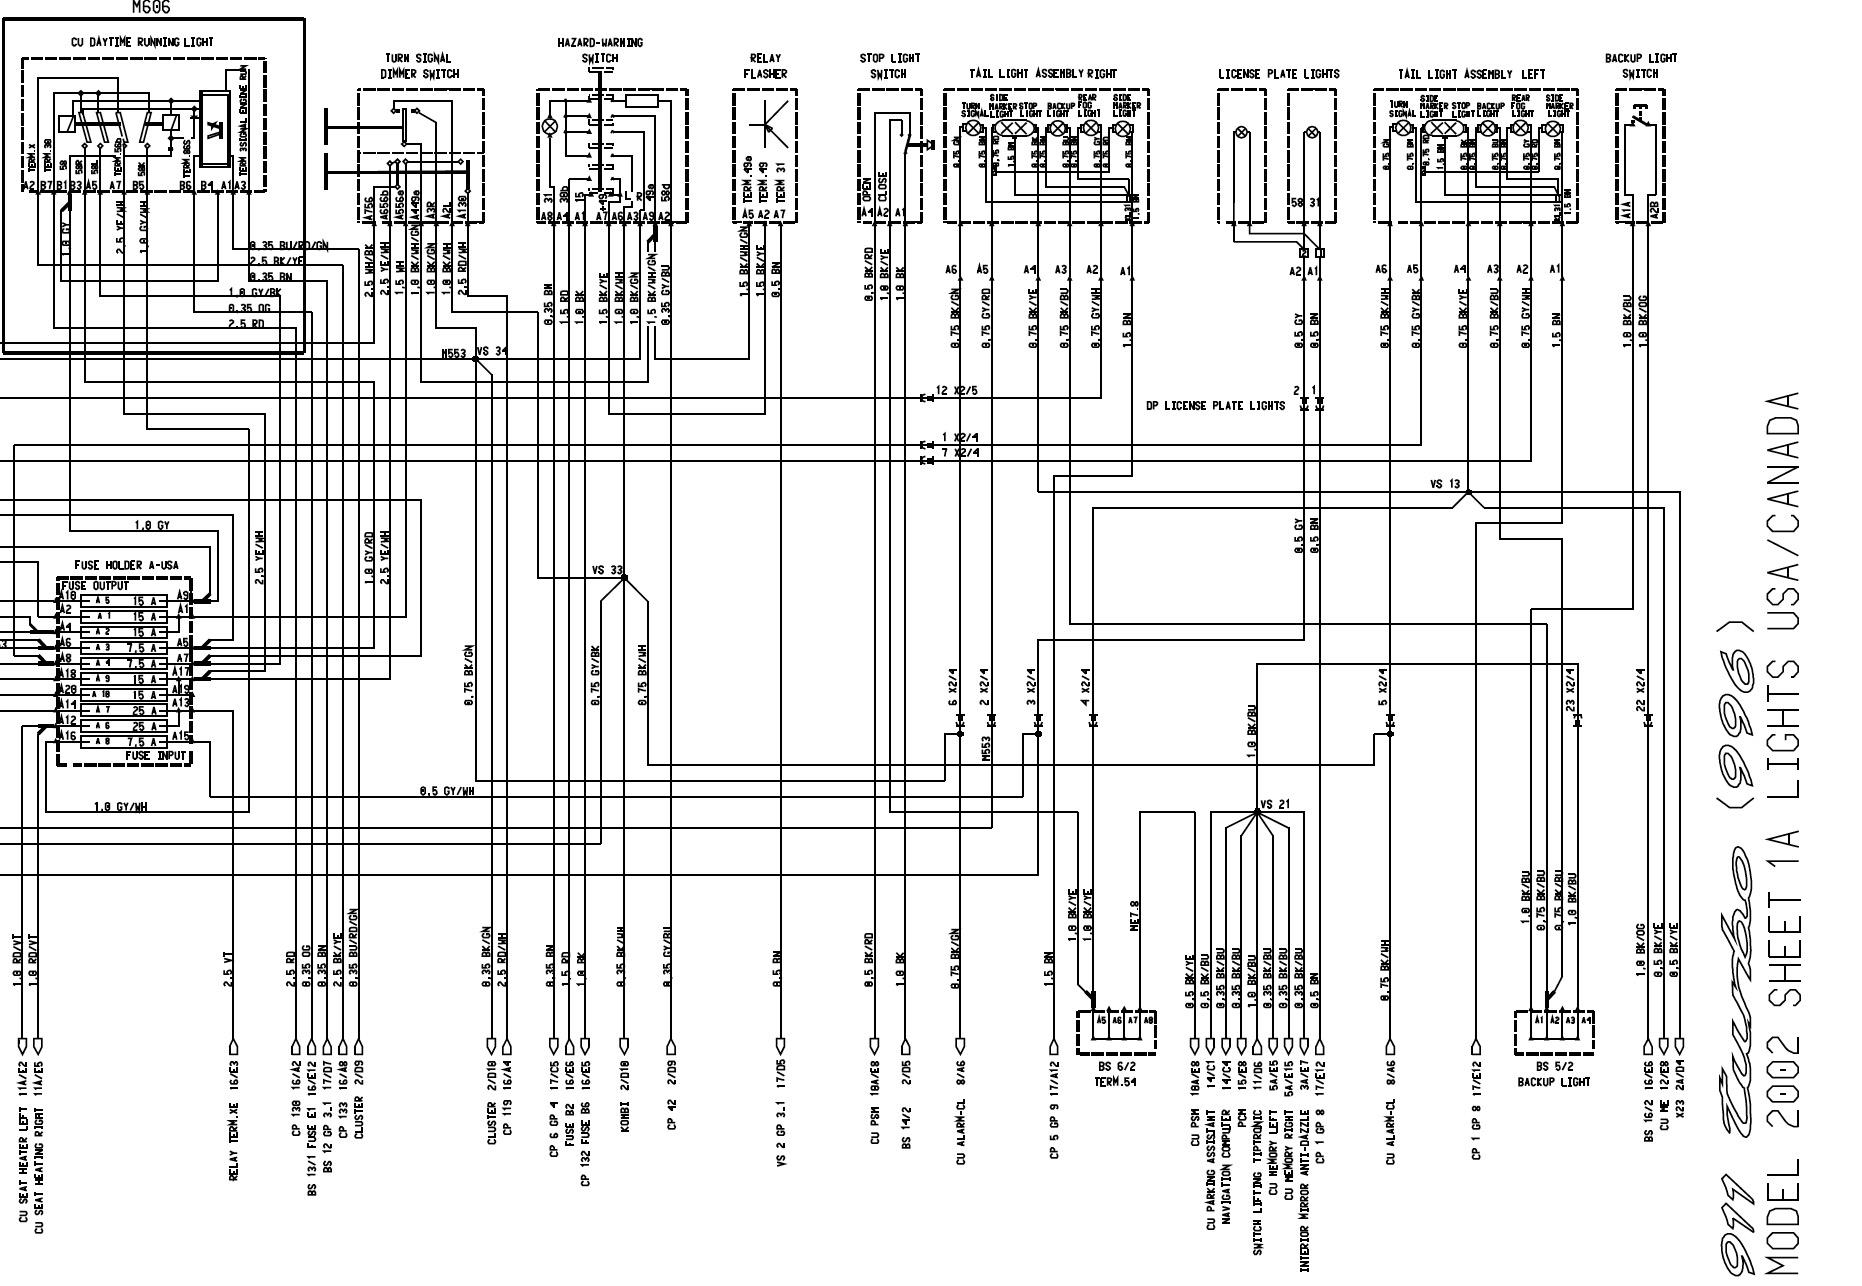 1252724d1505690904 2002 996 turbo wiring diagram headlight screen shot 2017 09 17 at 19.27.09?resize=665%2C459&ssl=1 jensen vm9212n wiring diagram the best wiring diagram 2017 on gah wiring diagrams